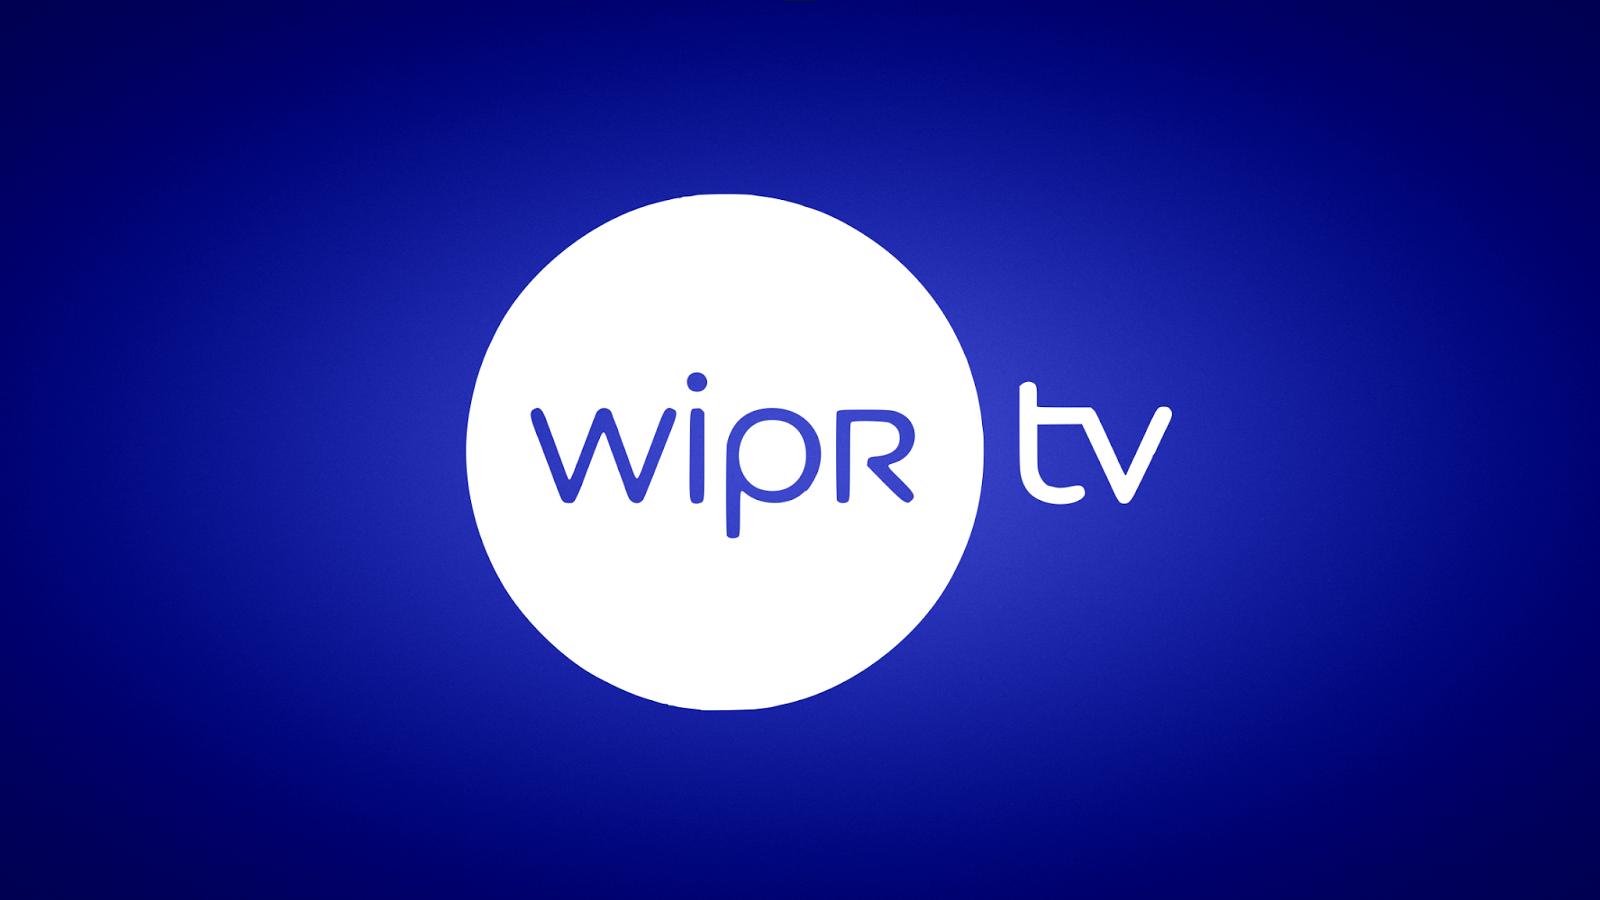 logo actualizado WIPR TV canal 6